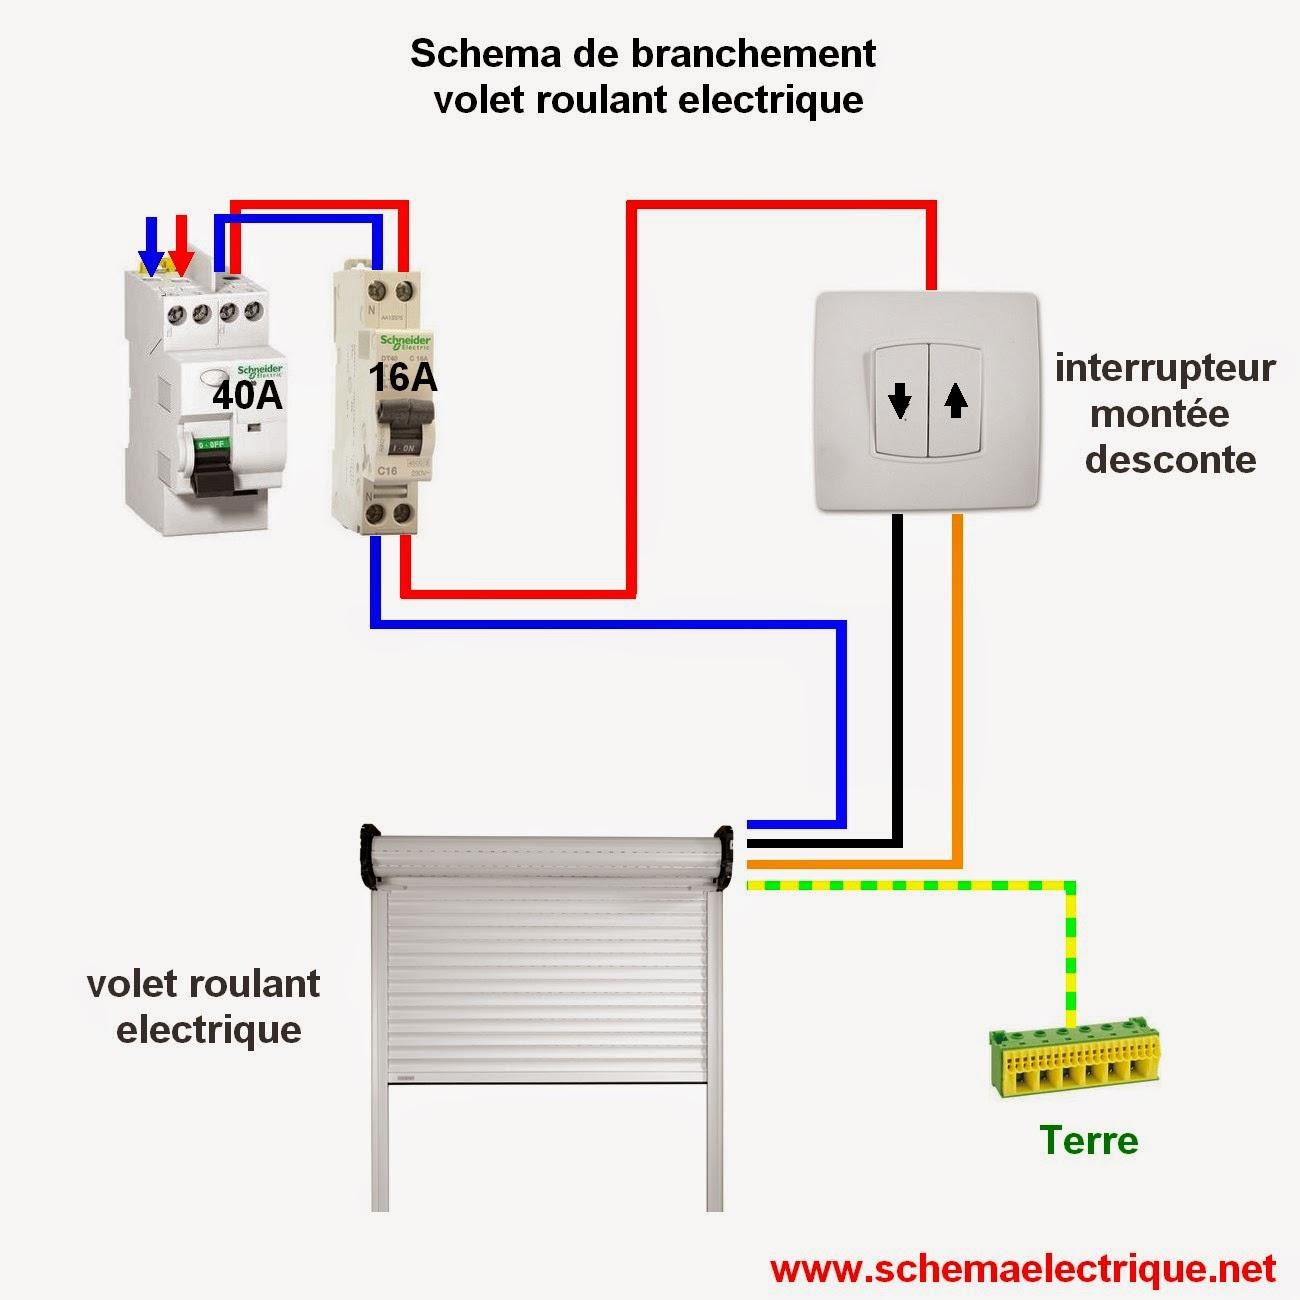 Schema electrique branchement cablage for Branchement prise telephone 4 fils